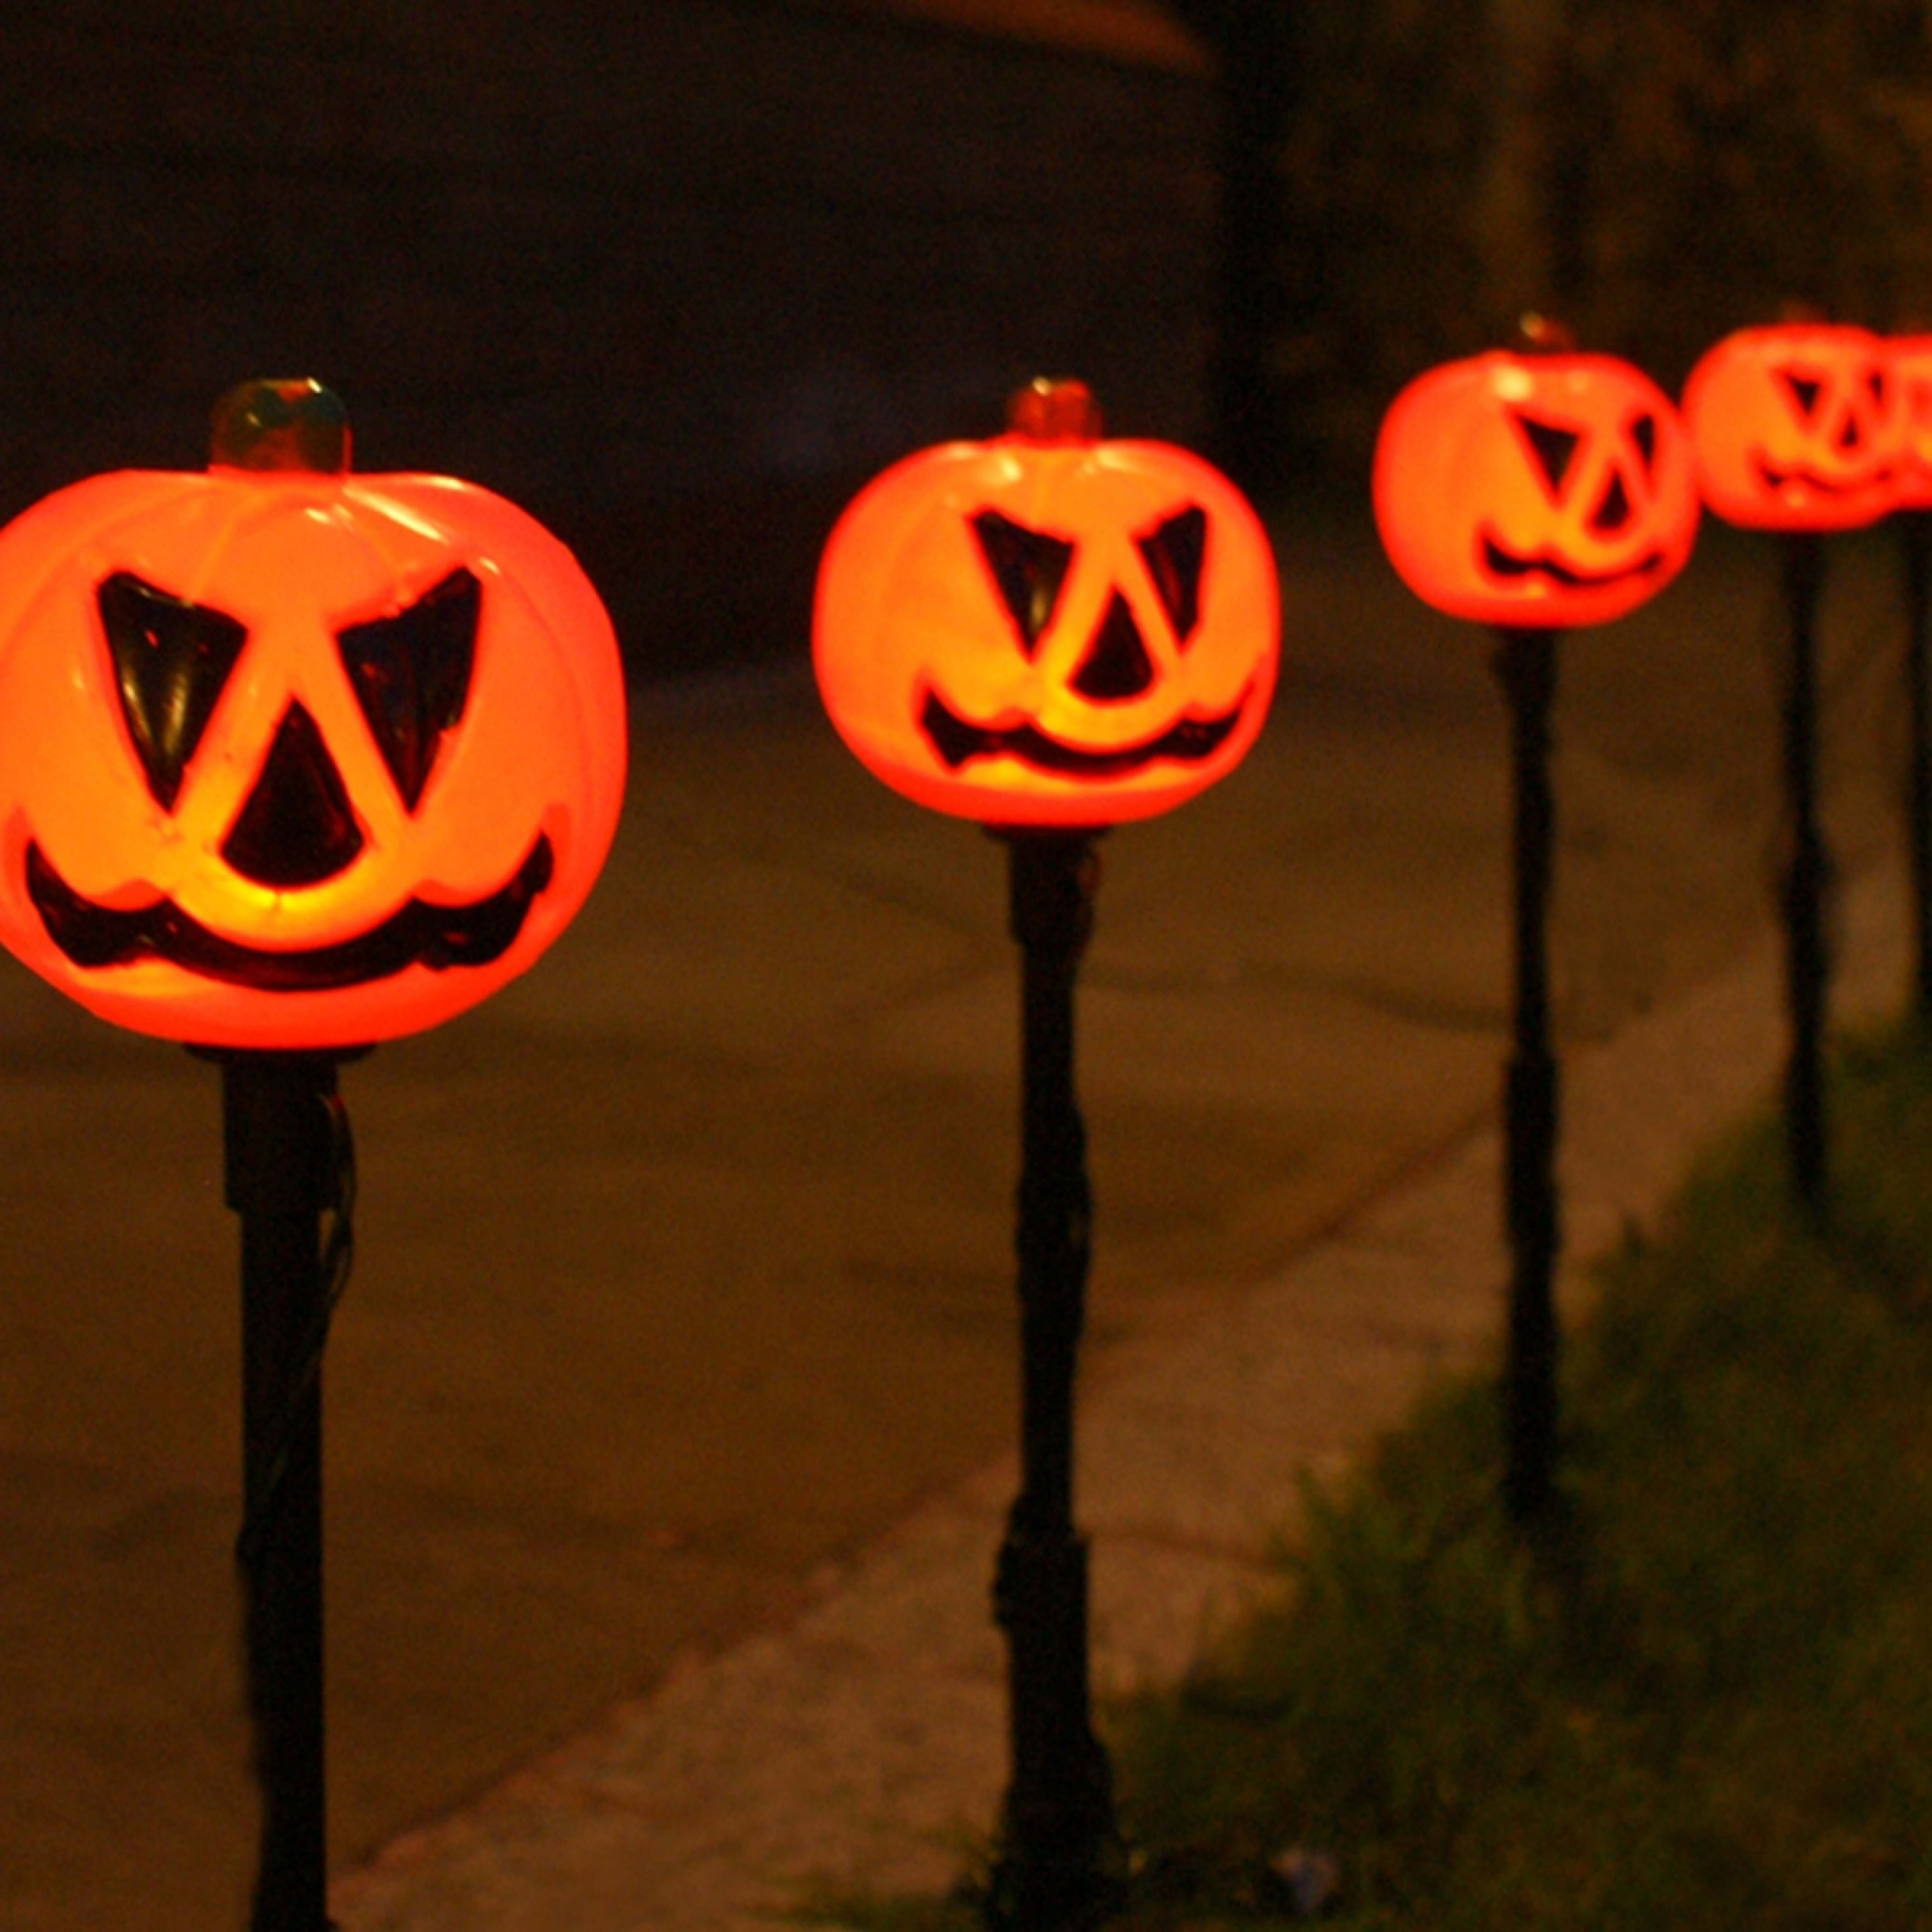 5 Outdoor Halloween Pumpkin Stake Lights, Orange Leds Pertaining To Newest Outdoor Pumpkin Lanterns (Gallery 5 of 20)